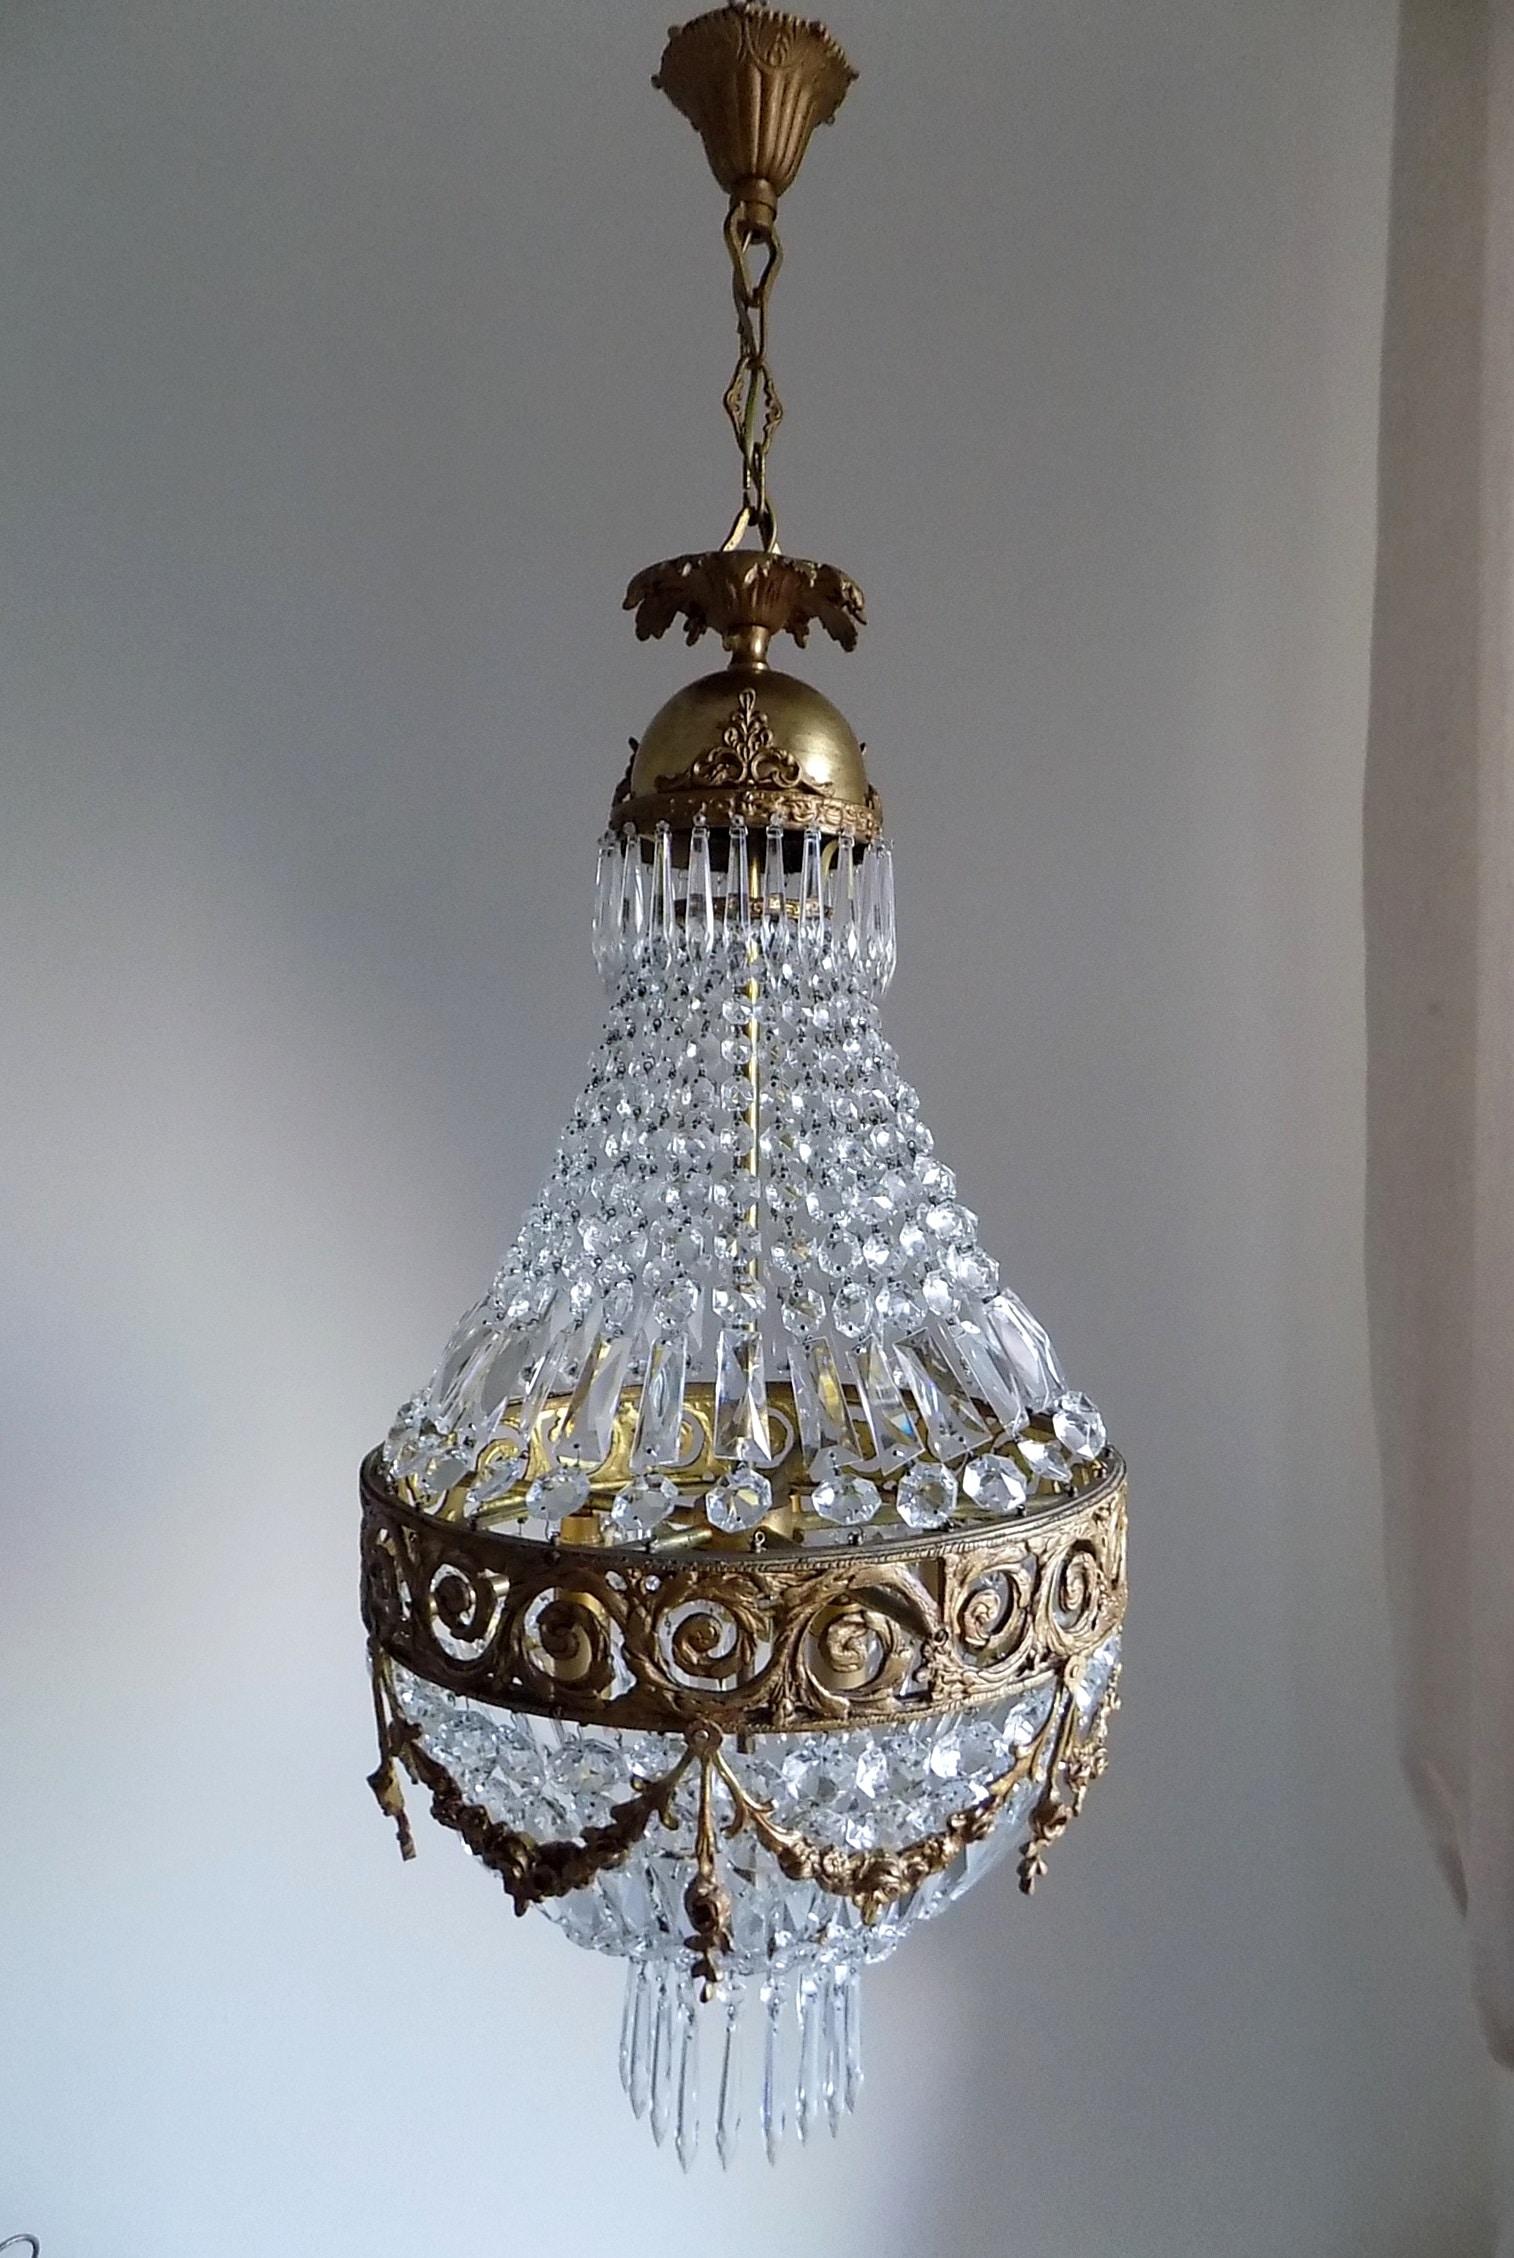 bronze kitchen chandelier pull out shelves antique empire style - lorella dia